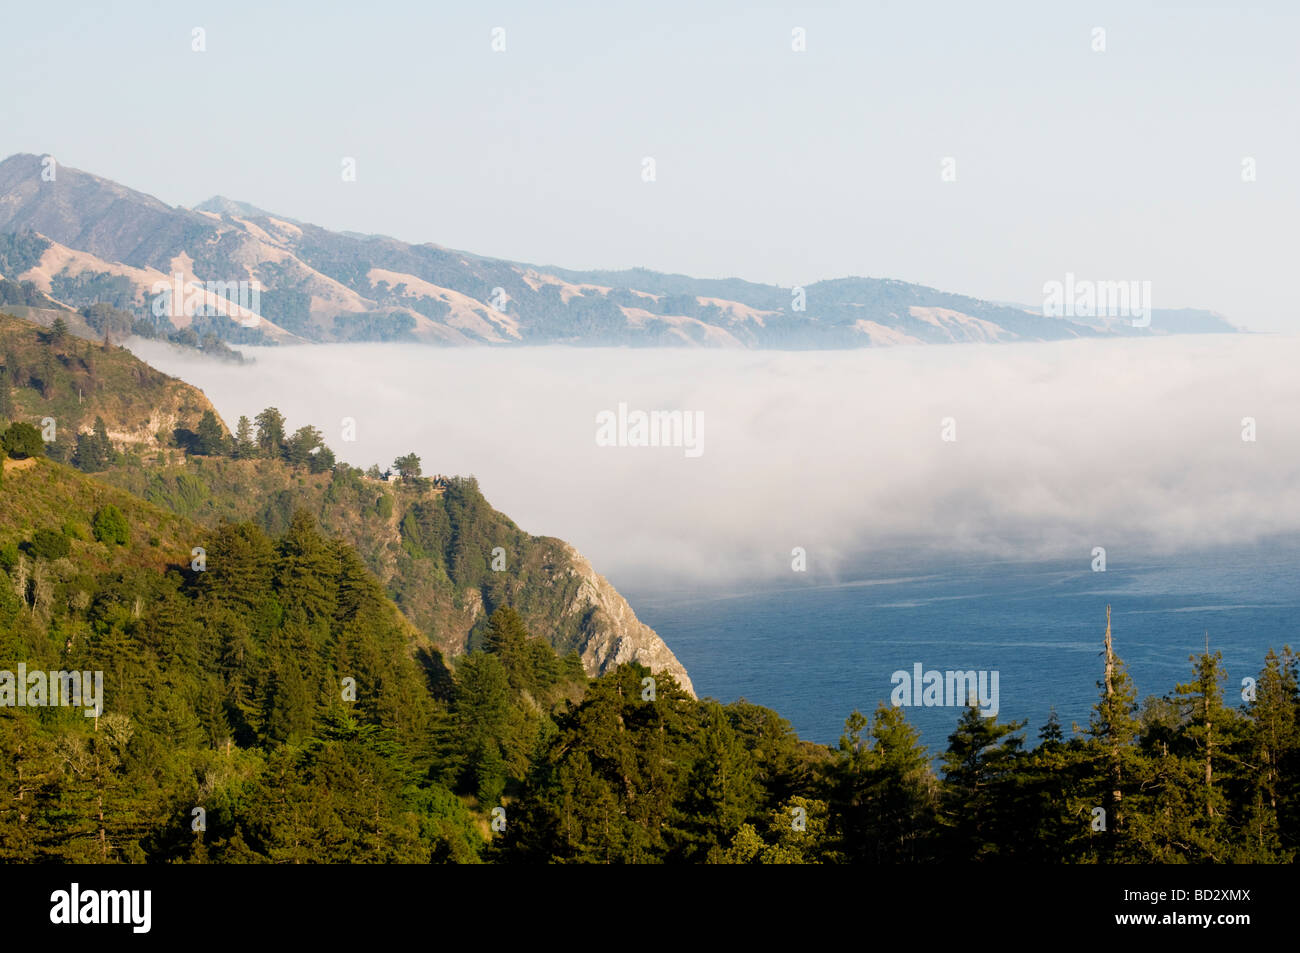 overlooking  the fog Big Sur California coast - Stock Image